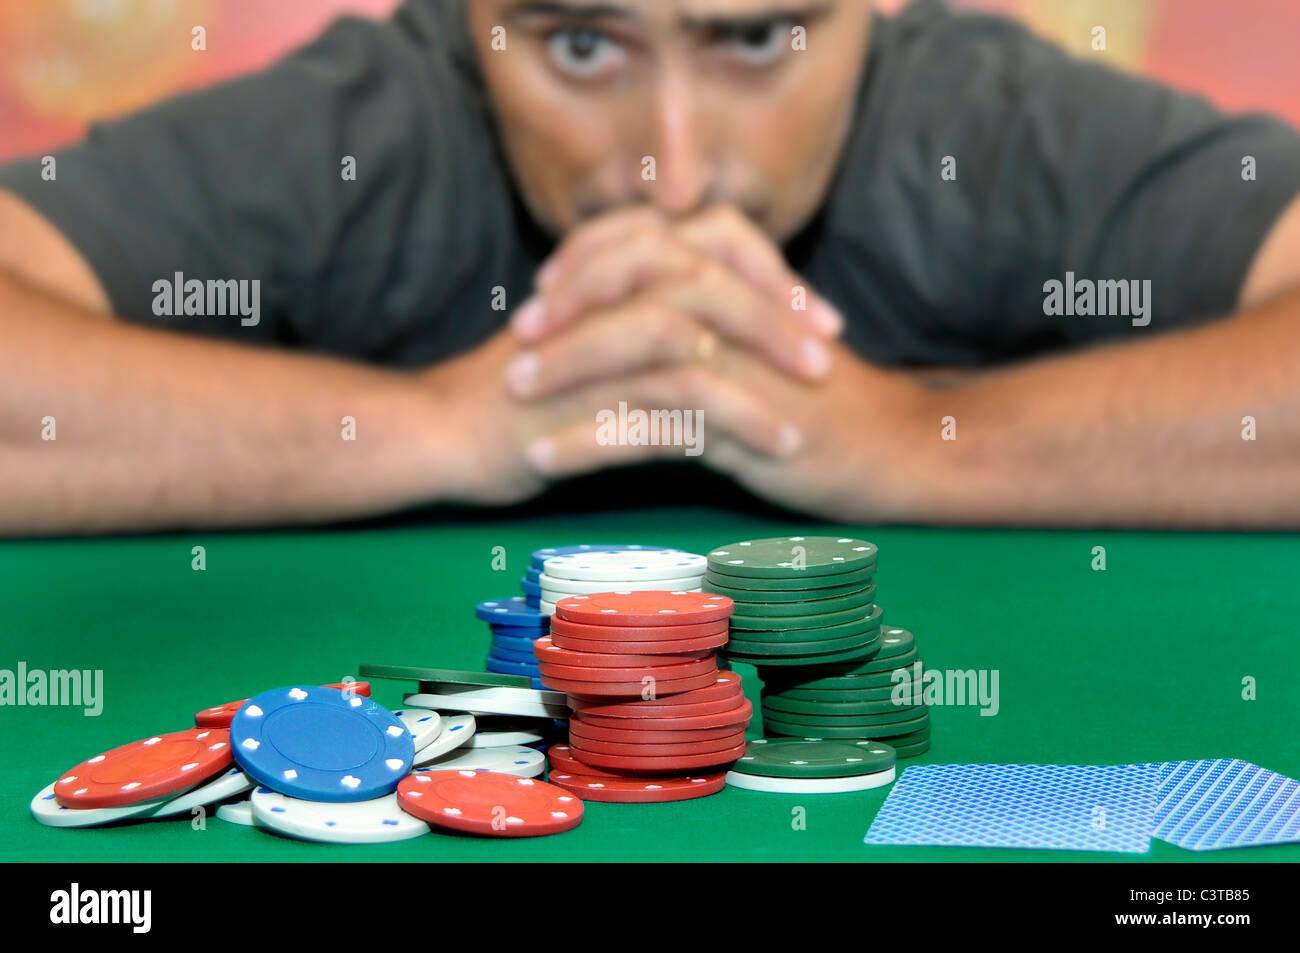 Gambling stock photos pyramid shape casino las vegas